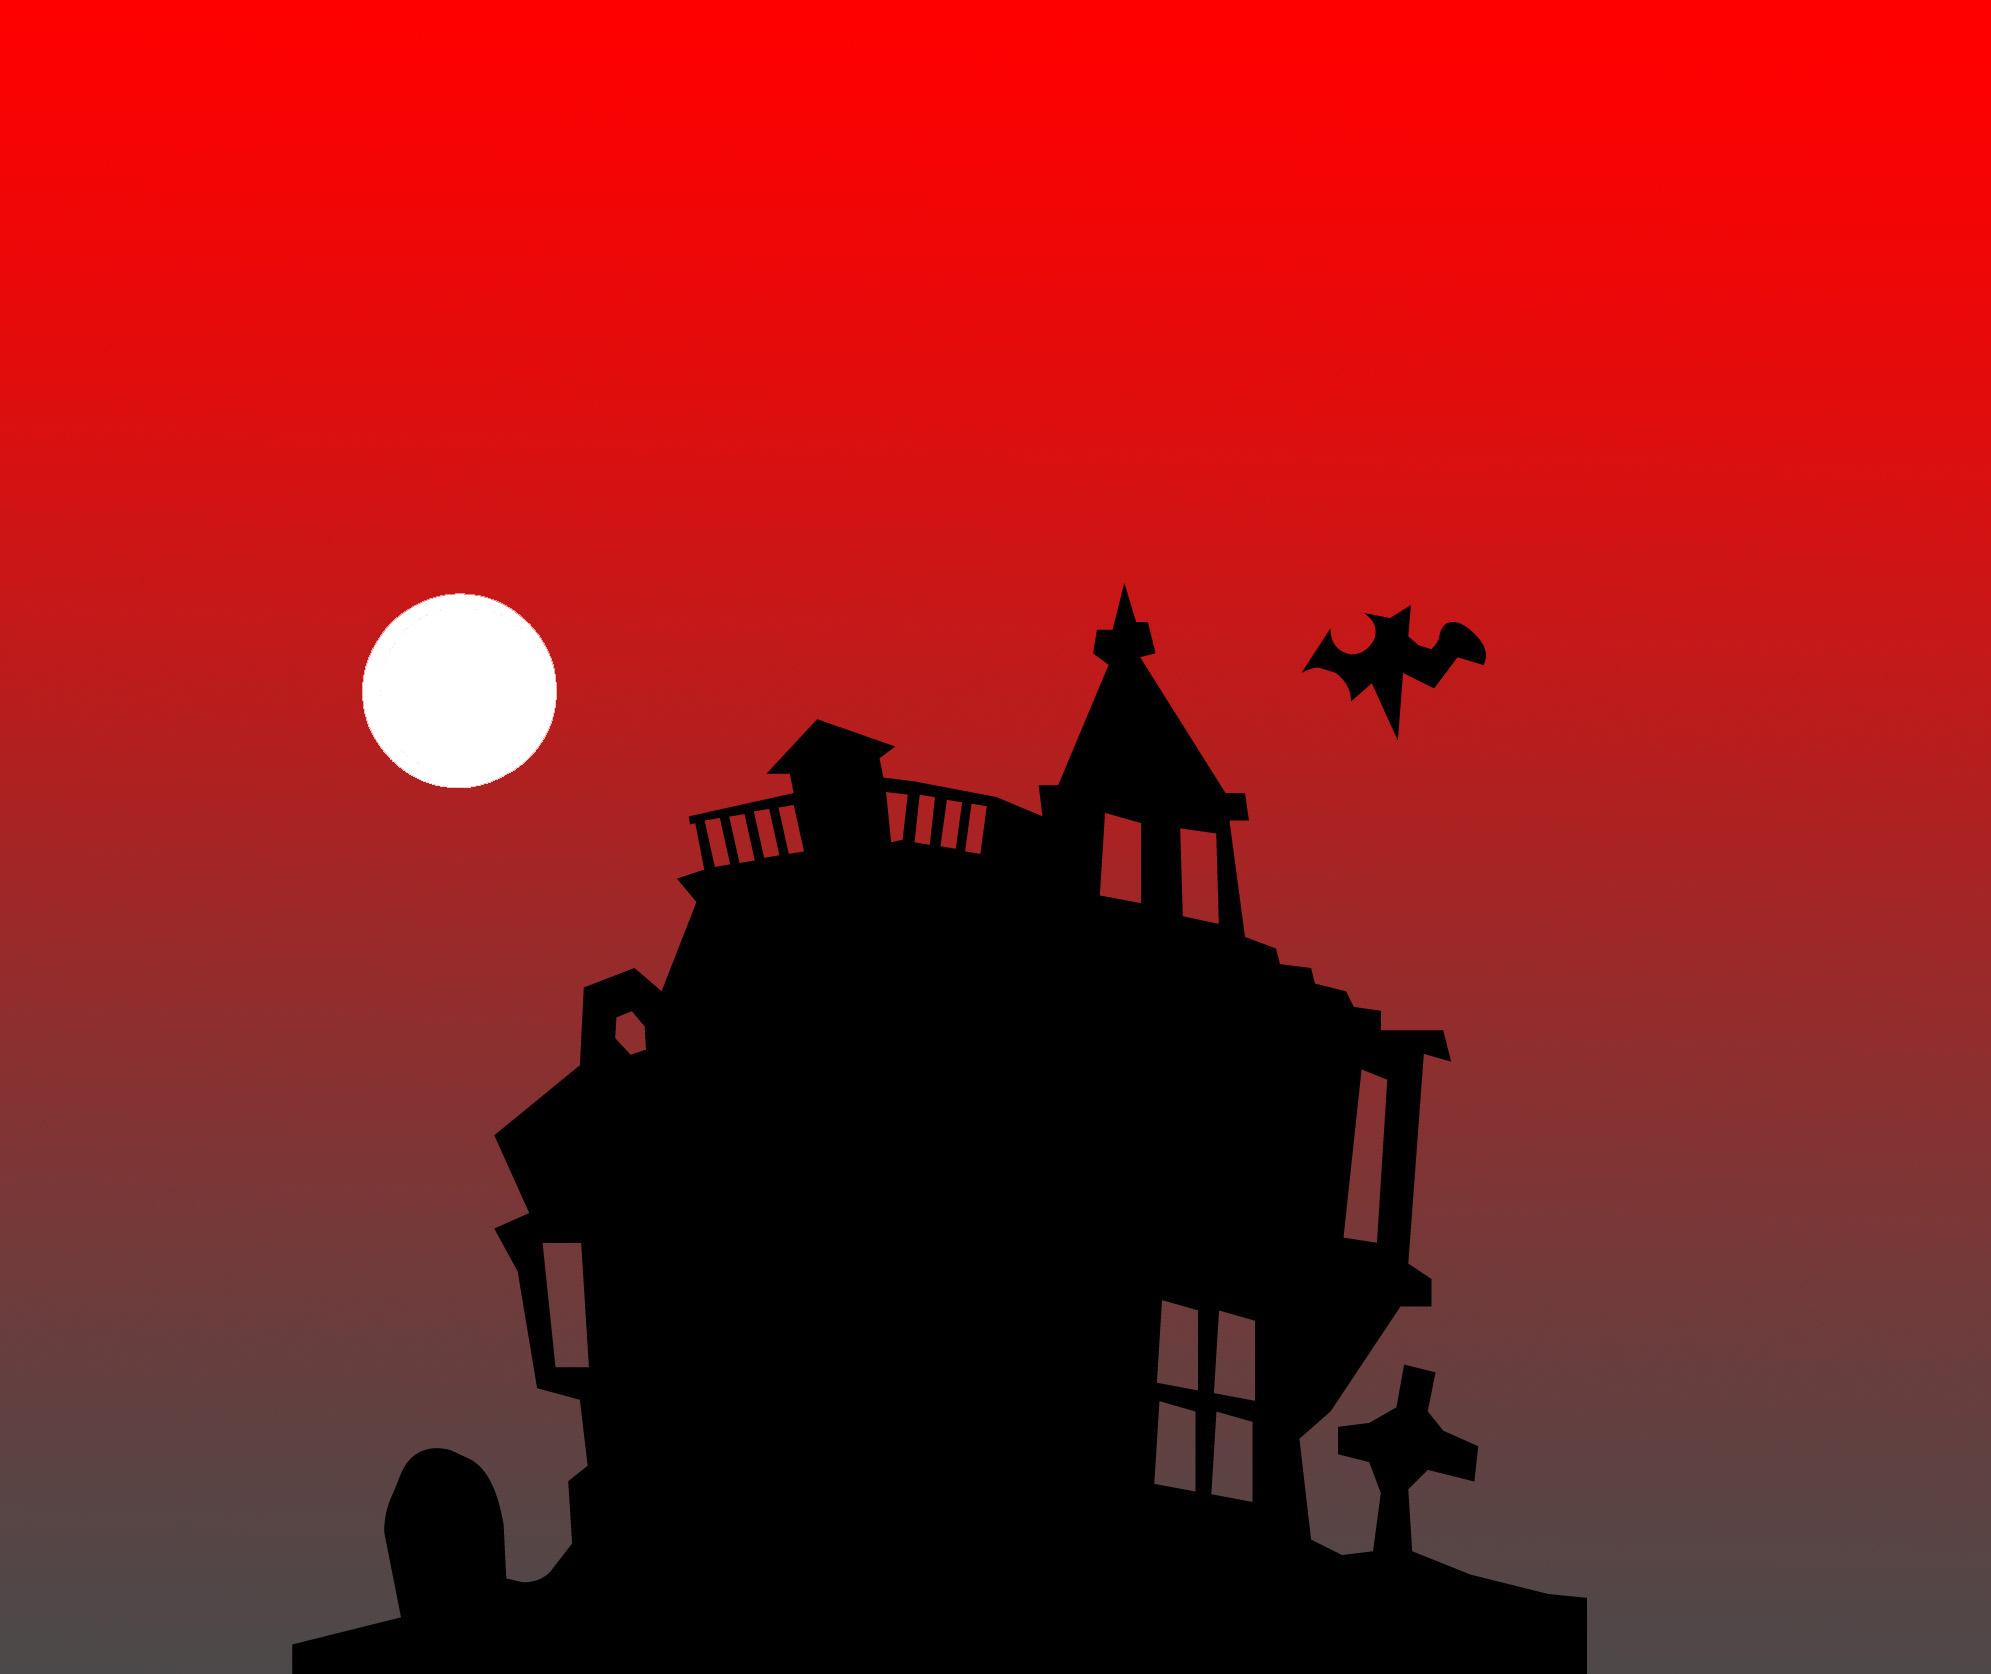 Haunted clipart moon #14